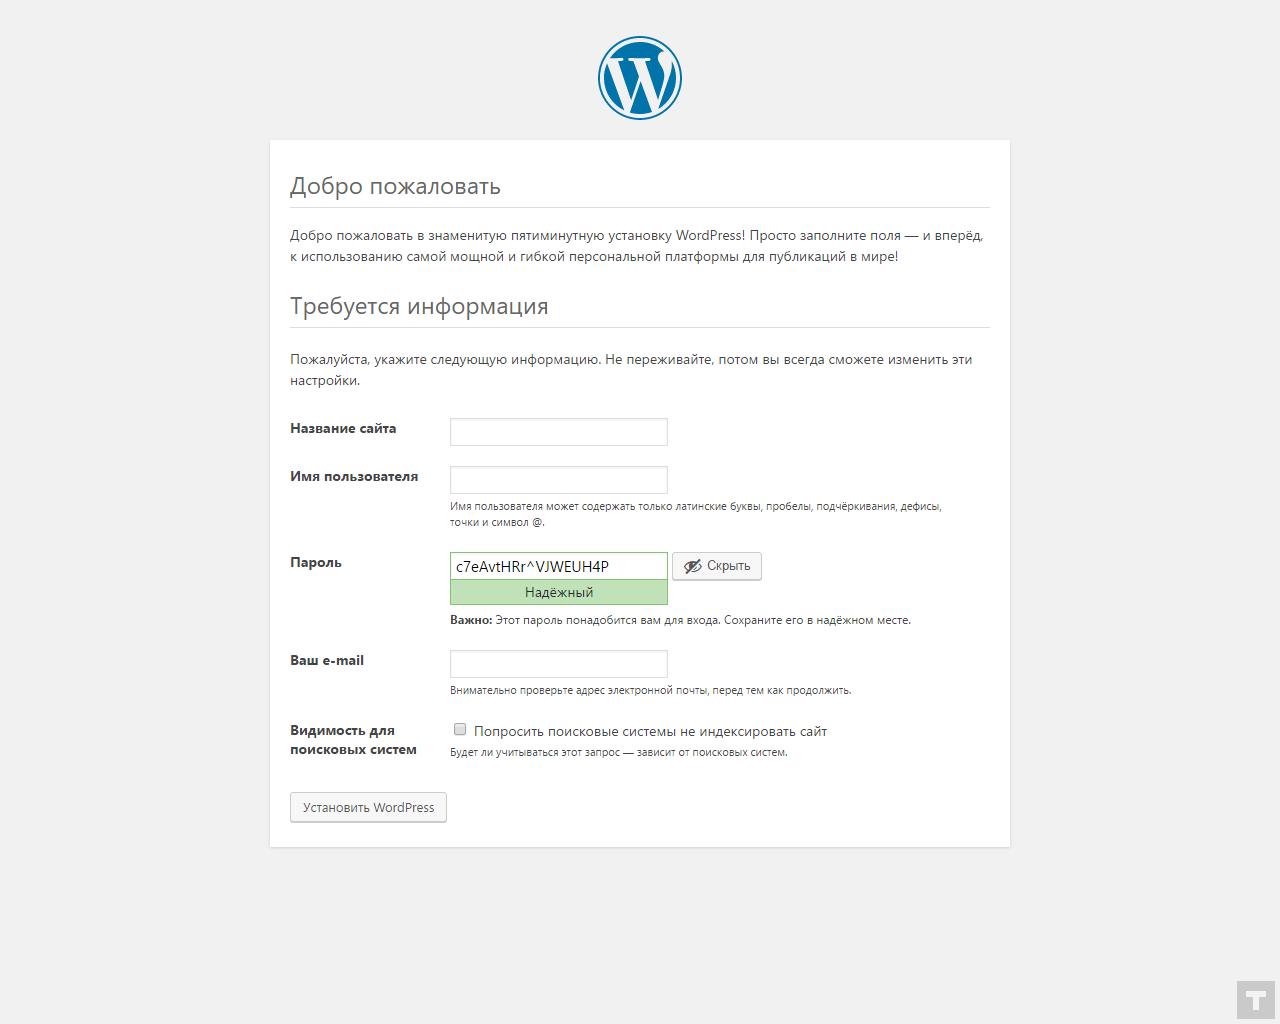 Демо данные для WordPress